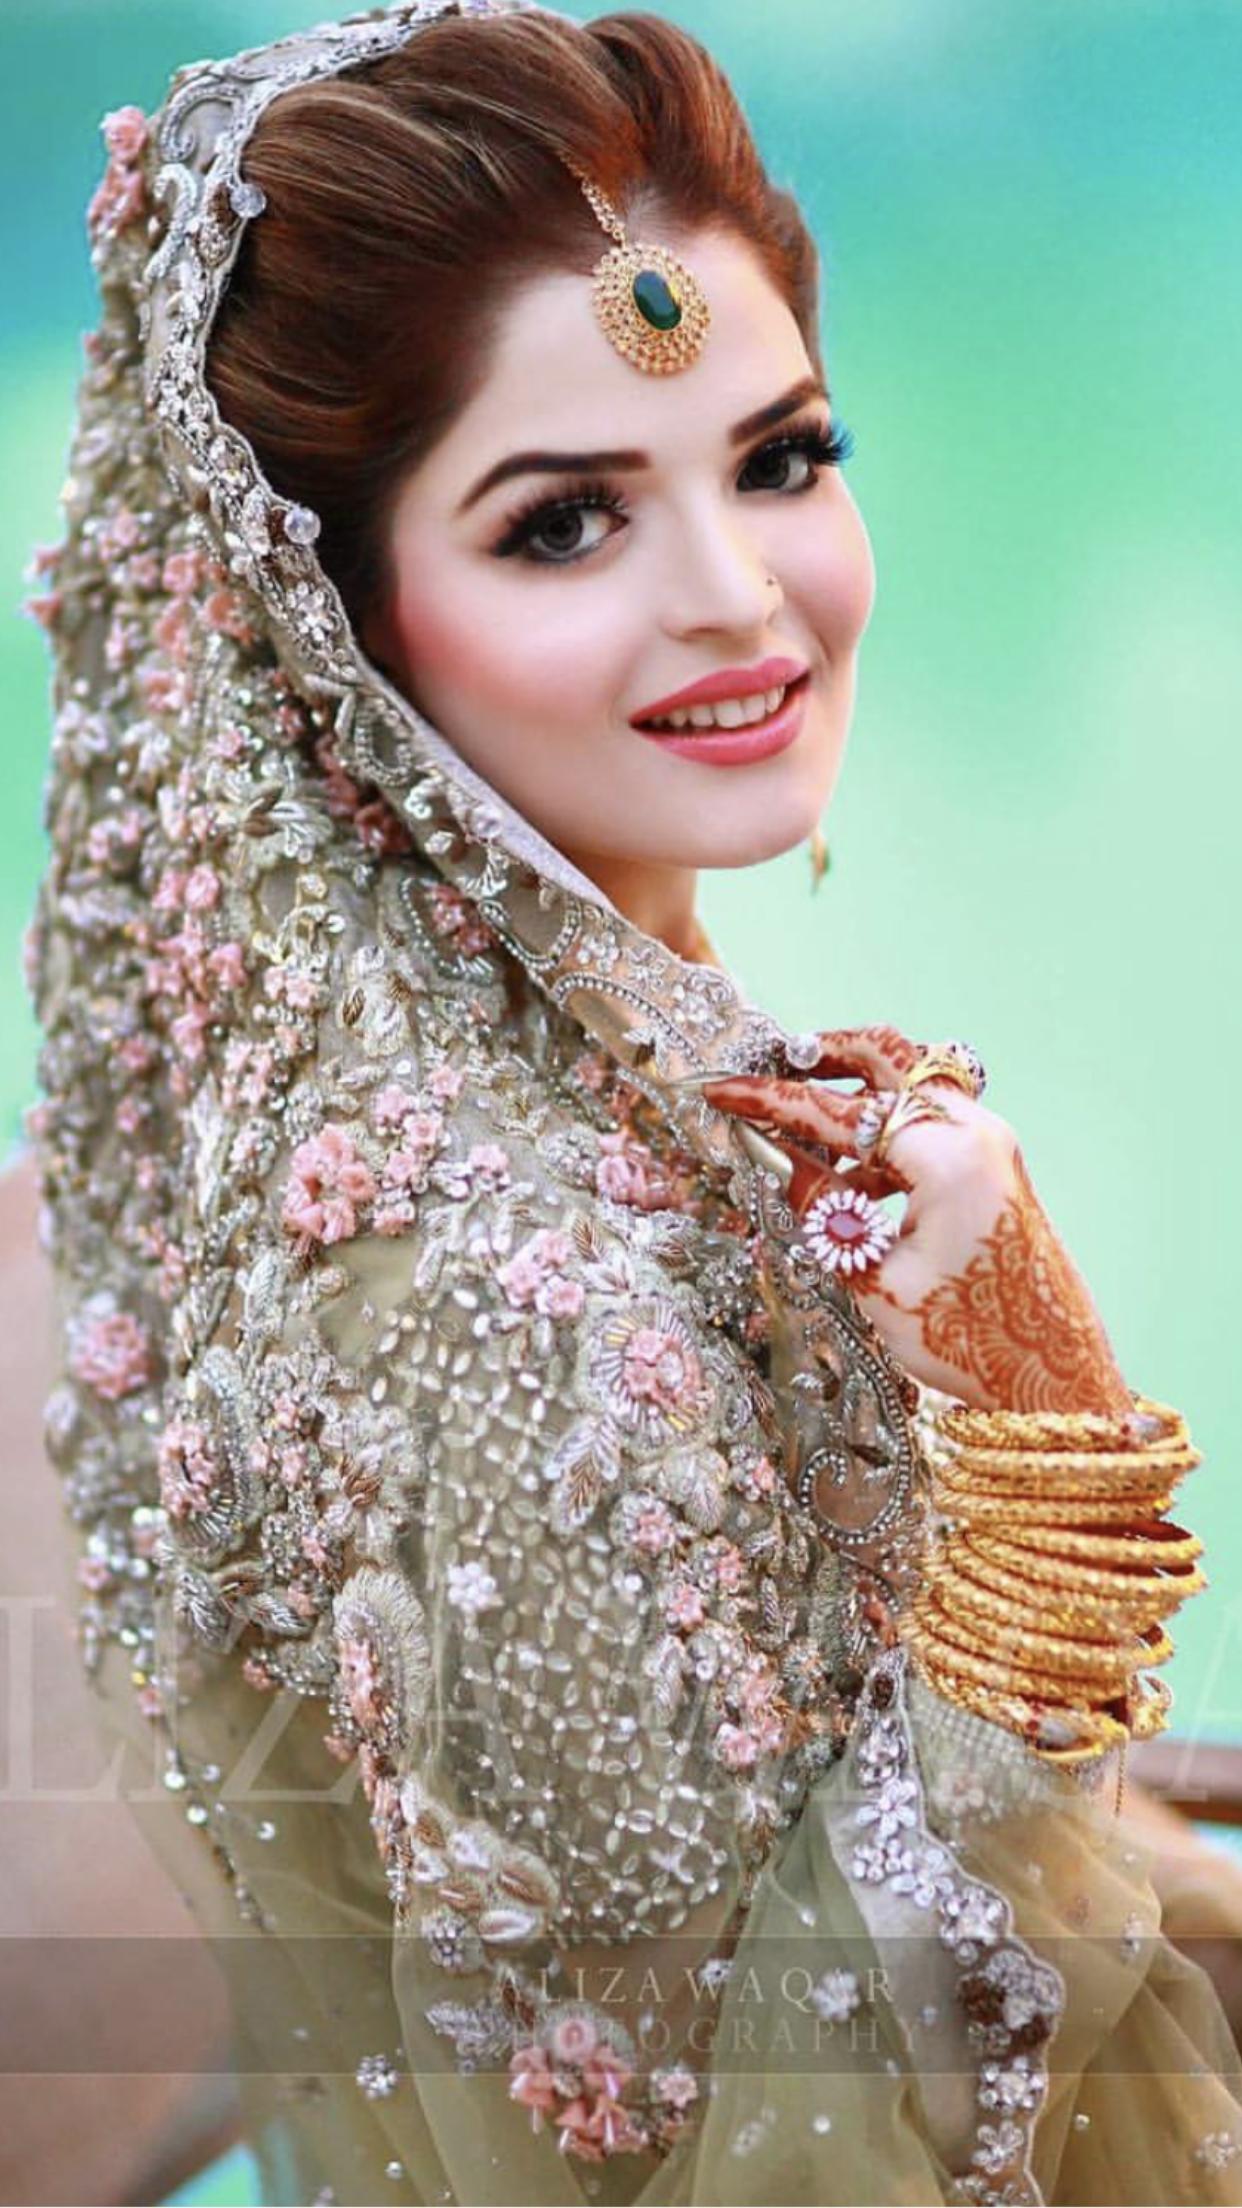 Best wedding dresses karachi  The beauty makes it beautiful  Womenus Fashion  Pinterest